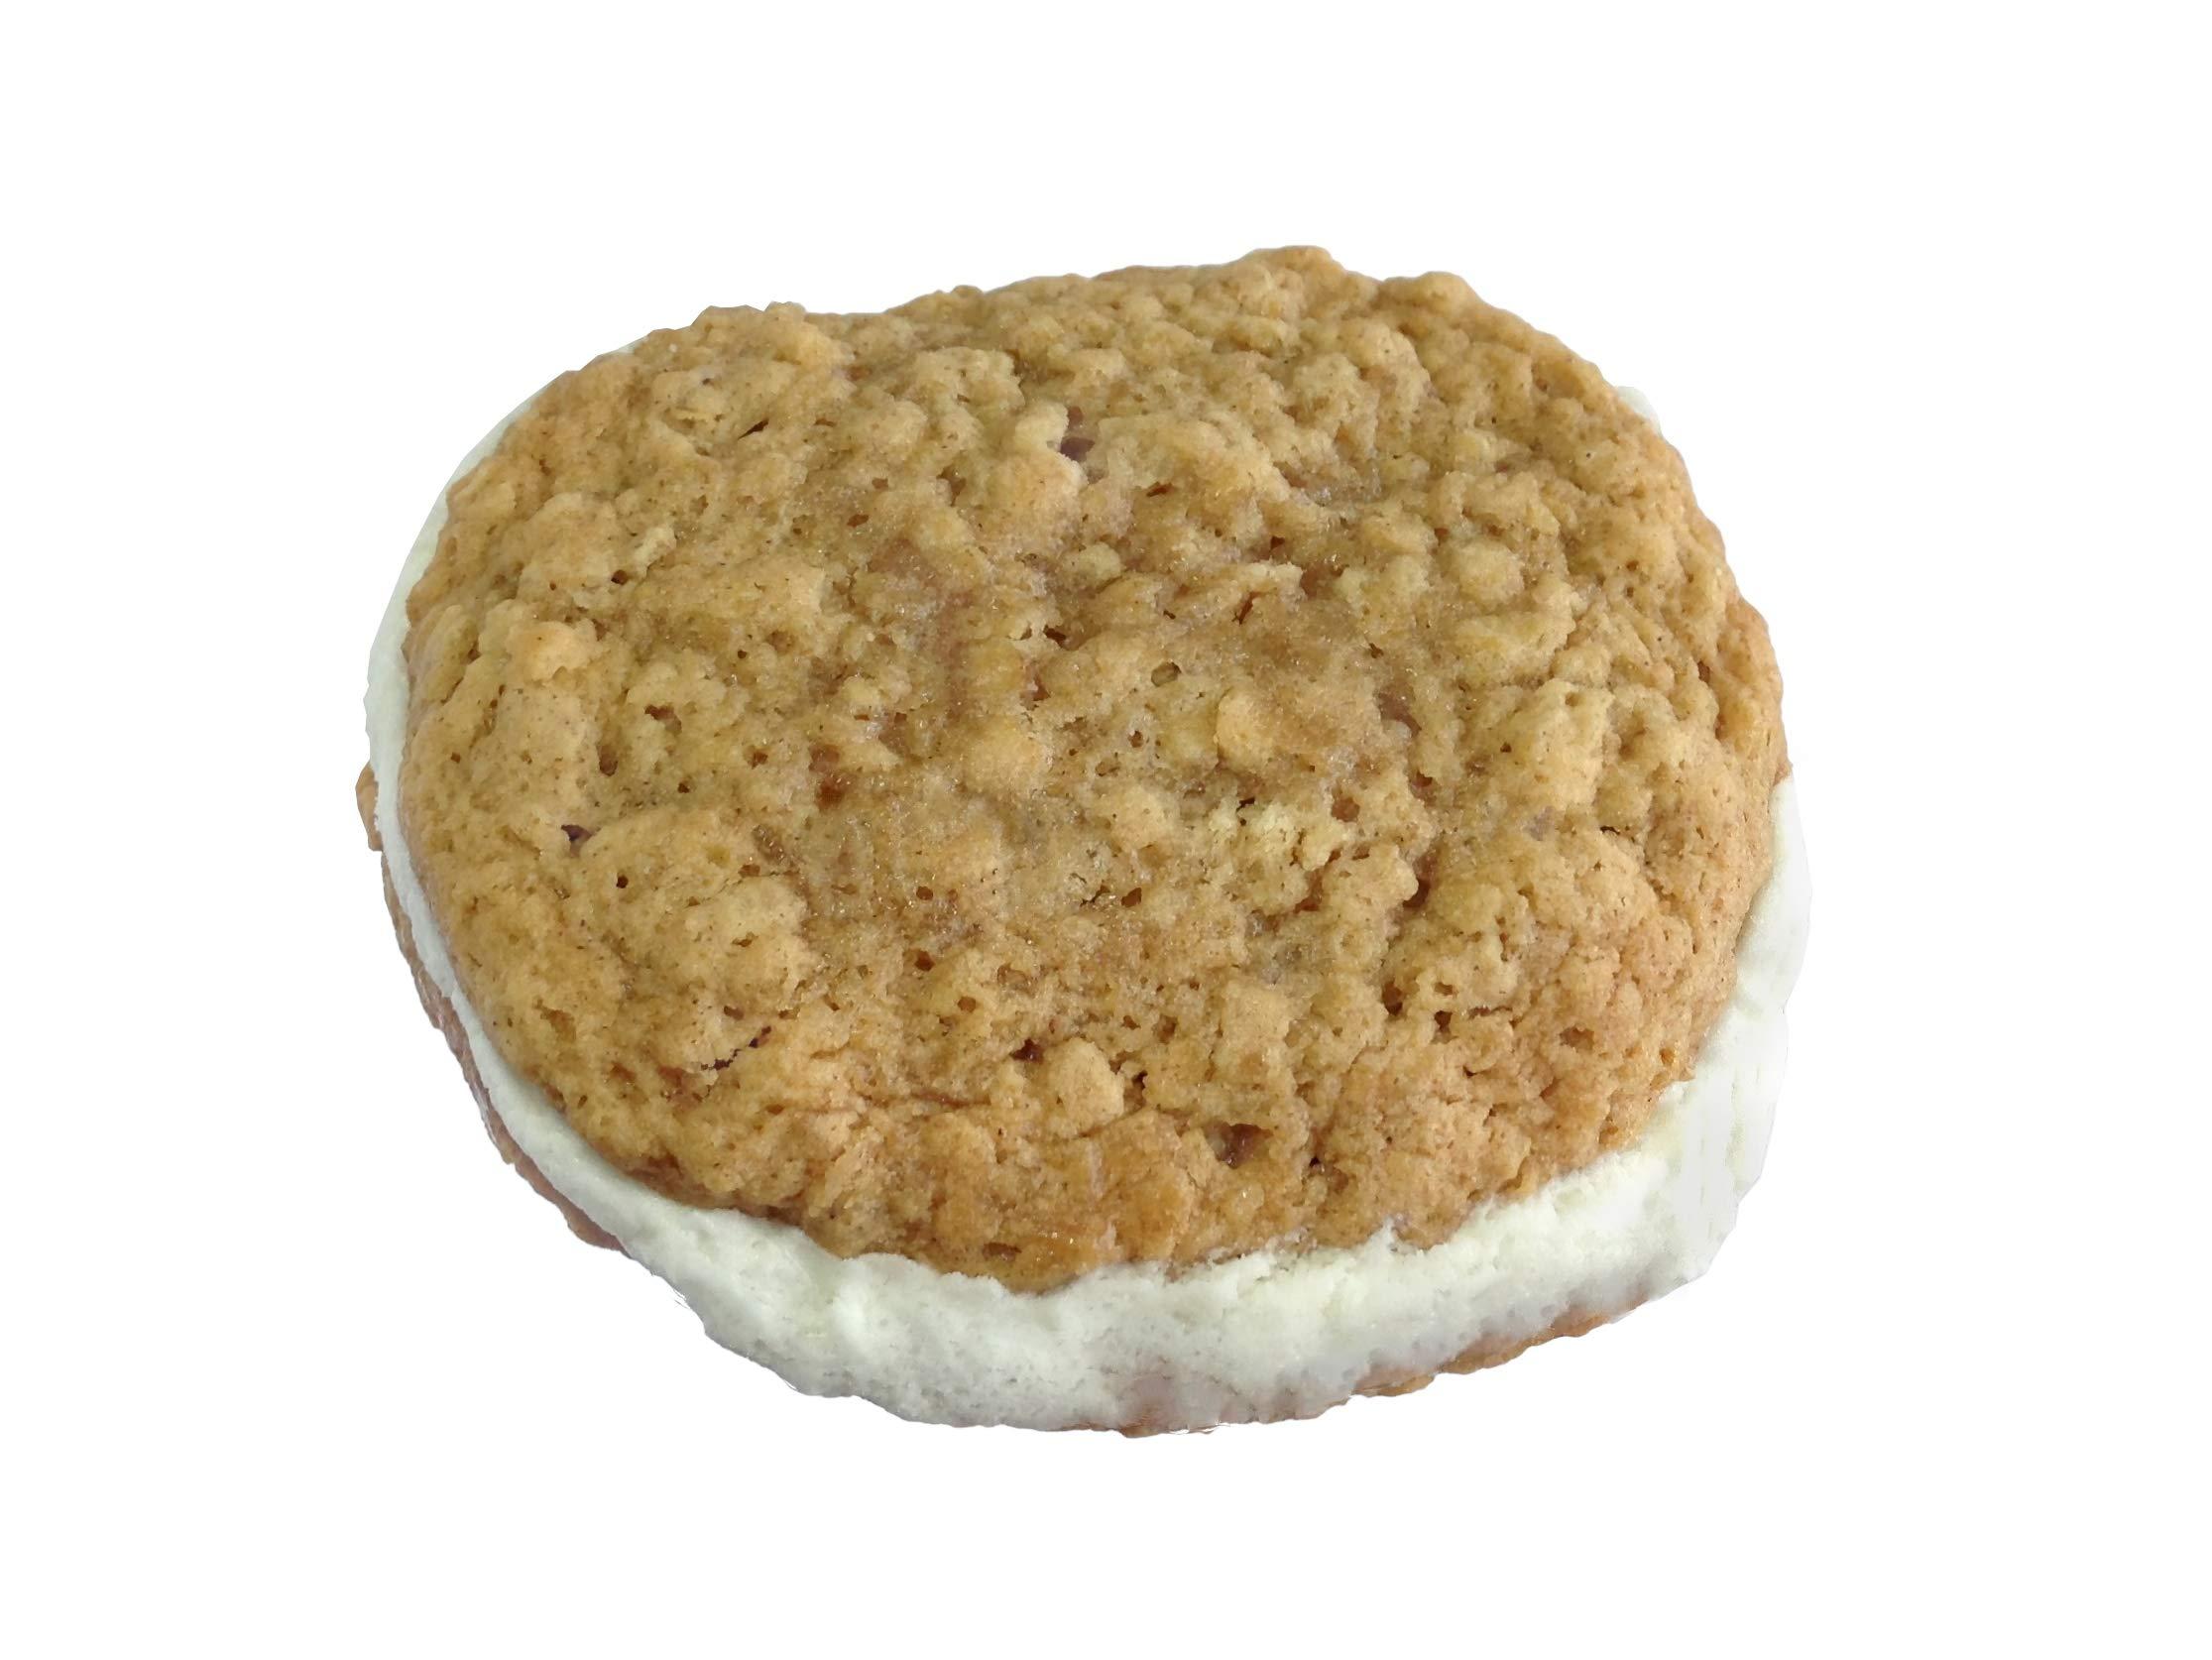 Bird-in-Hand Bake Shop Homemade Whoopie Pies, Oatmeal, Favorite Amish Food (Pack of 9)